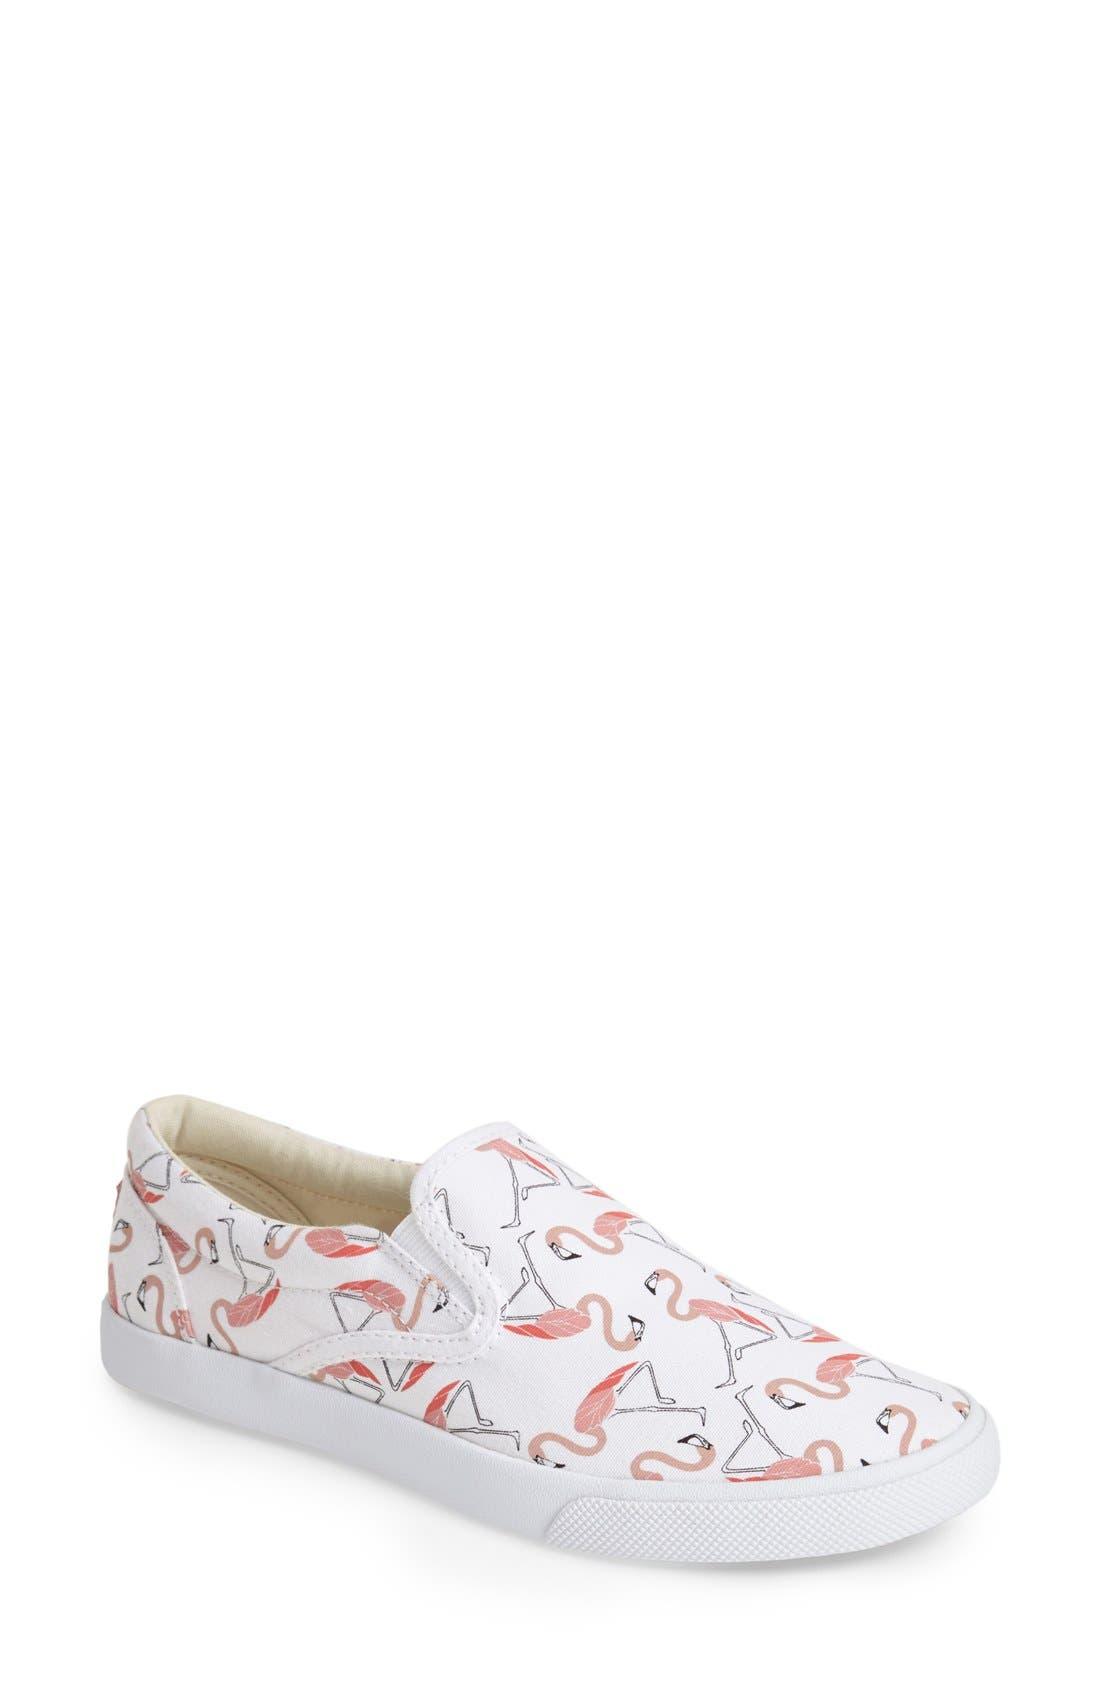 'Flamingos' Slip-On Sneaker, Main, color, 100